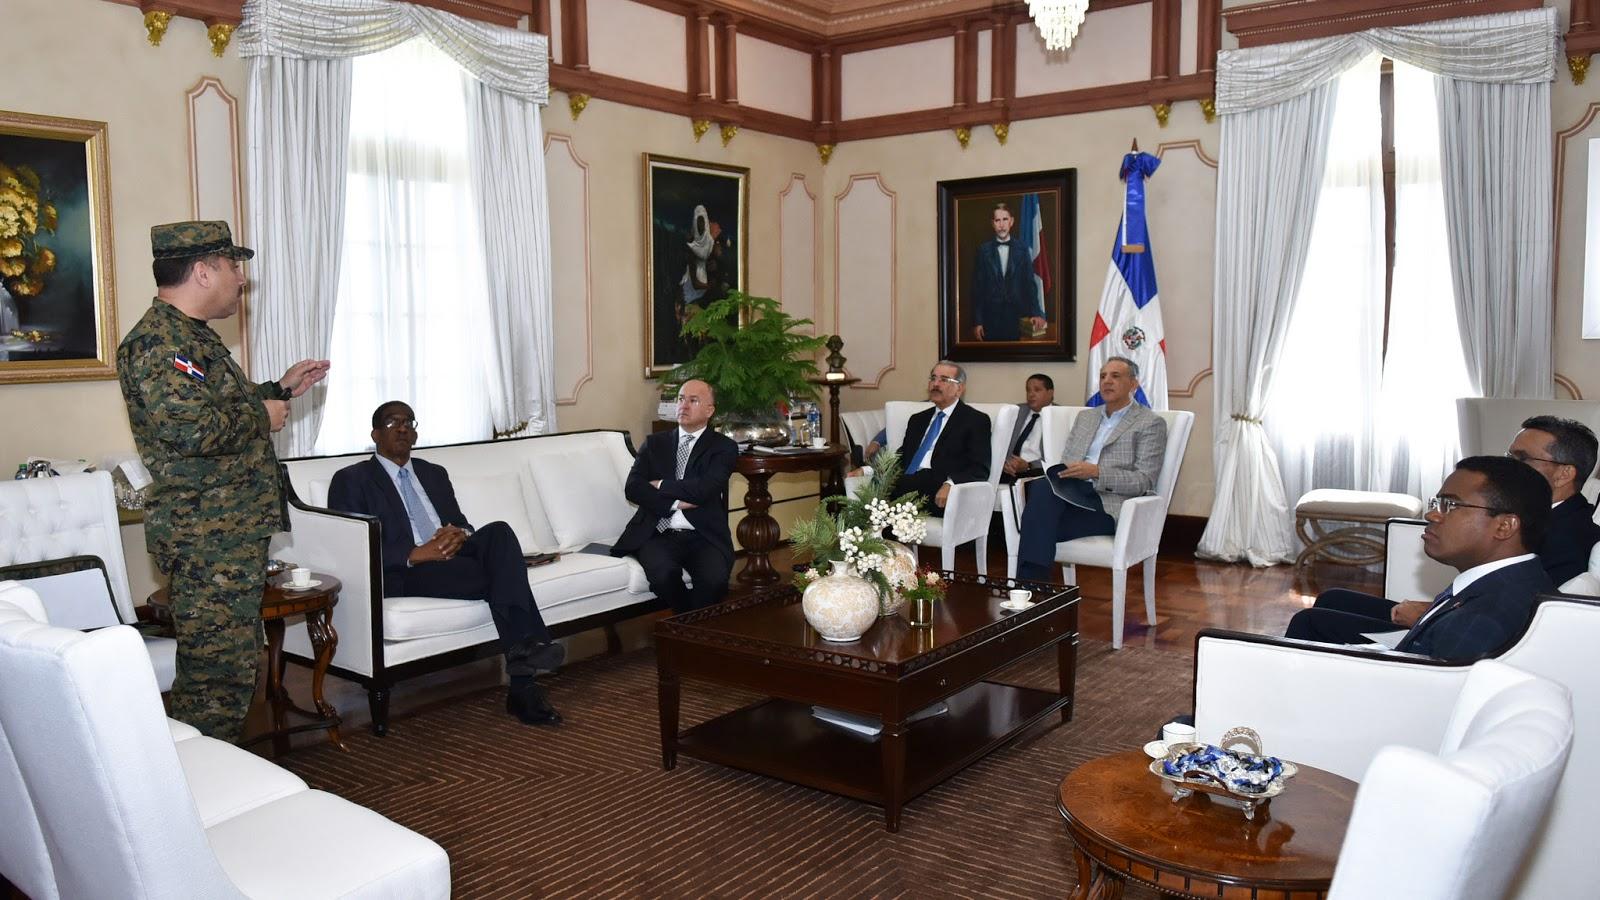 VIDEO: Danilo Medina da seguimiento a avances proyectos agroforestales. Más de 117 mil tareas reforestadas